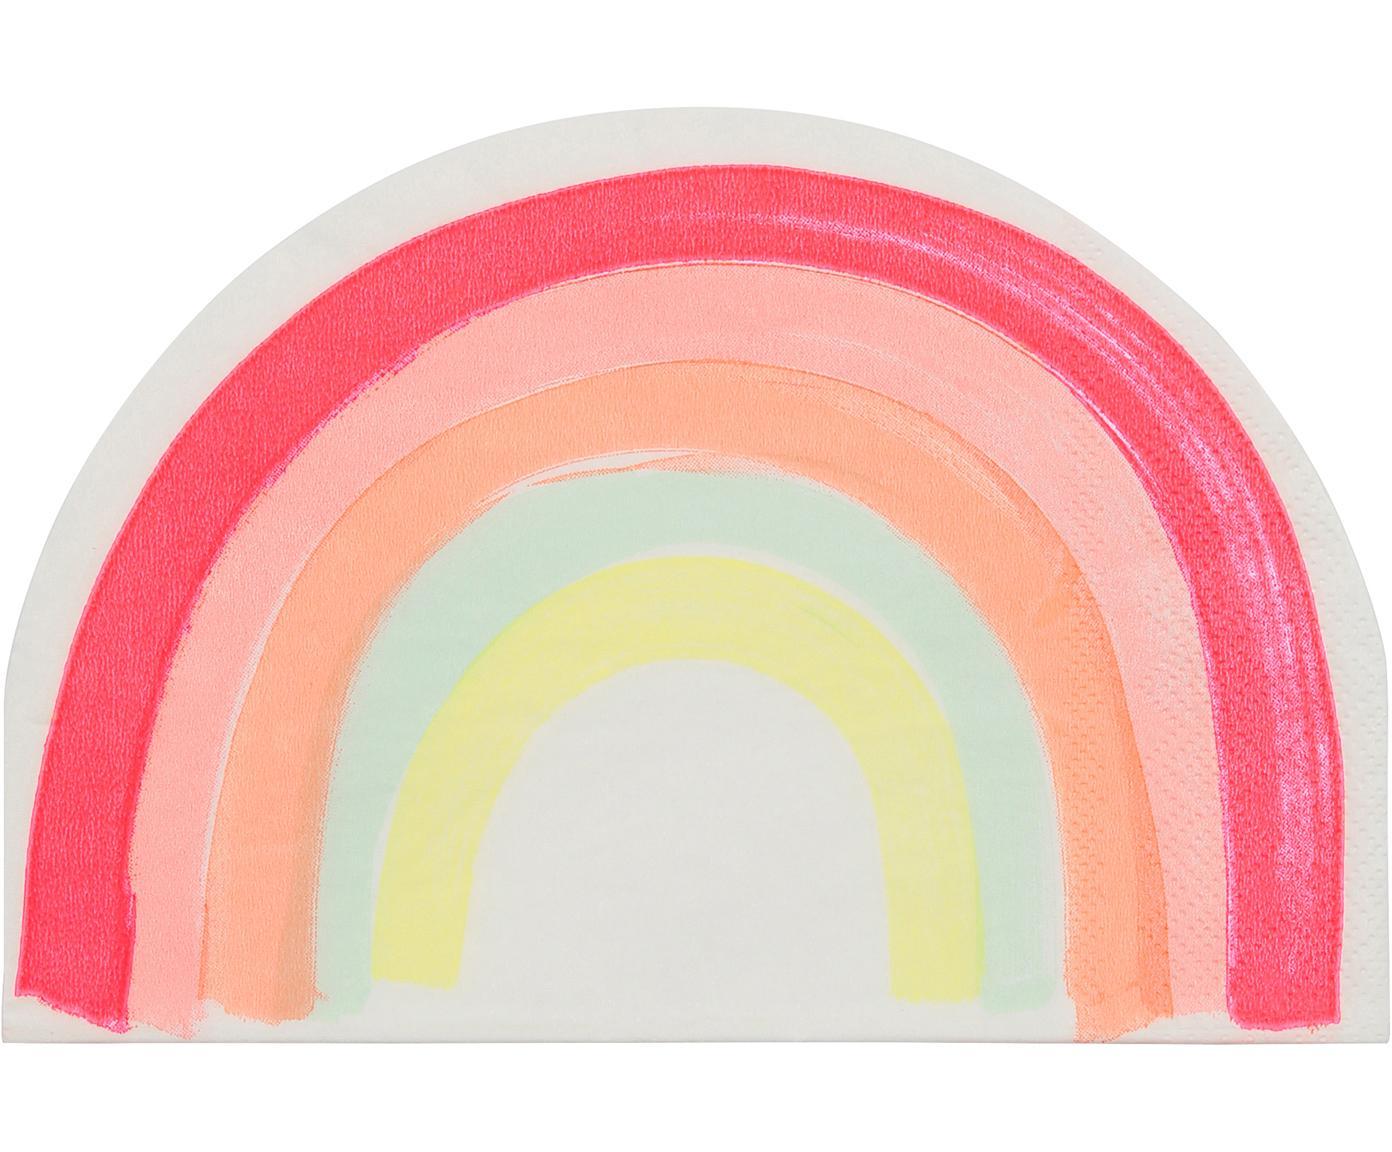 Papier-Servietten Rainbow, 20 Stück, Papier, Mehrfarbig, 12 x 17 cm